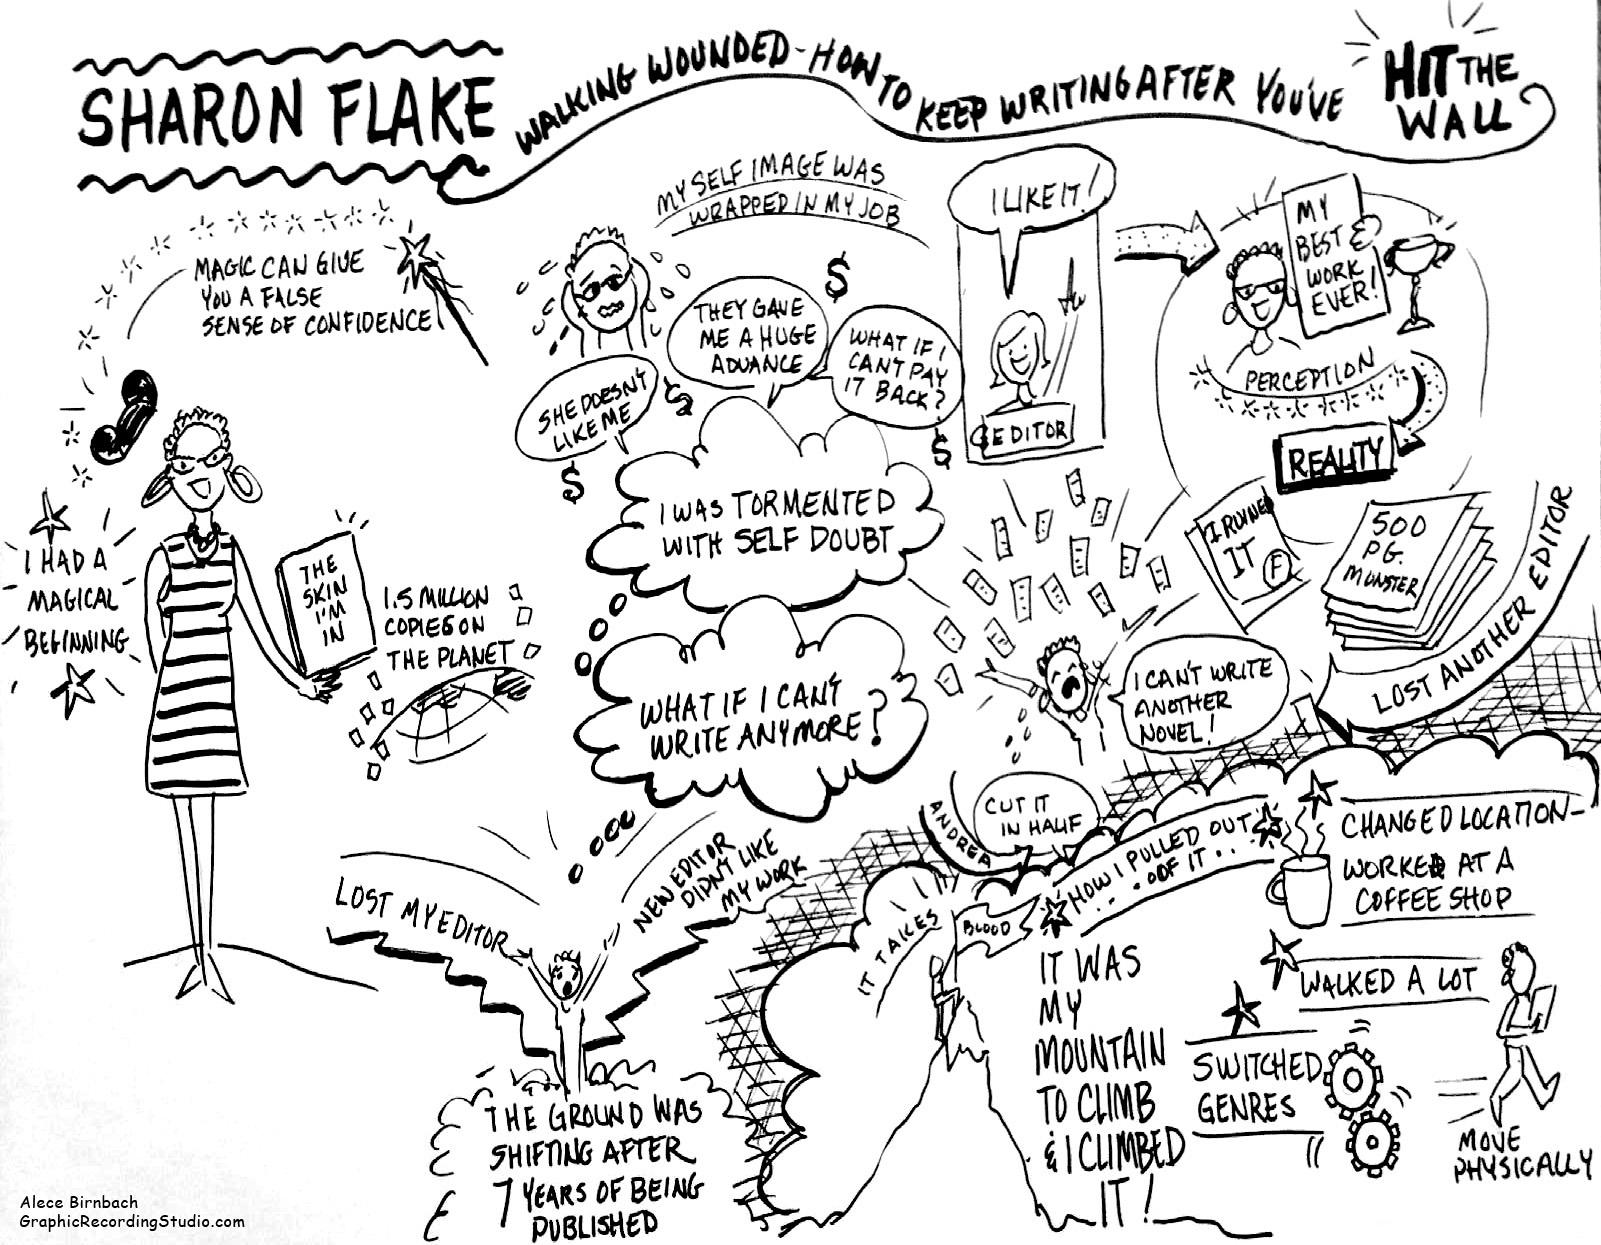 SharonFlake.jpg